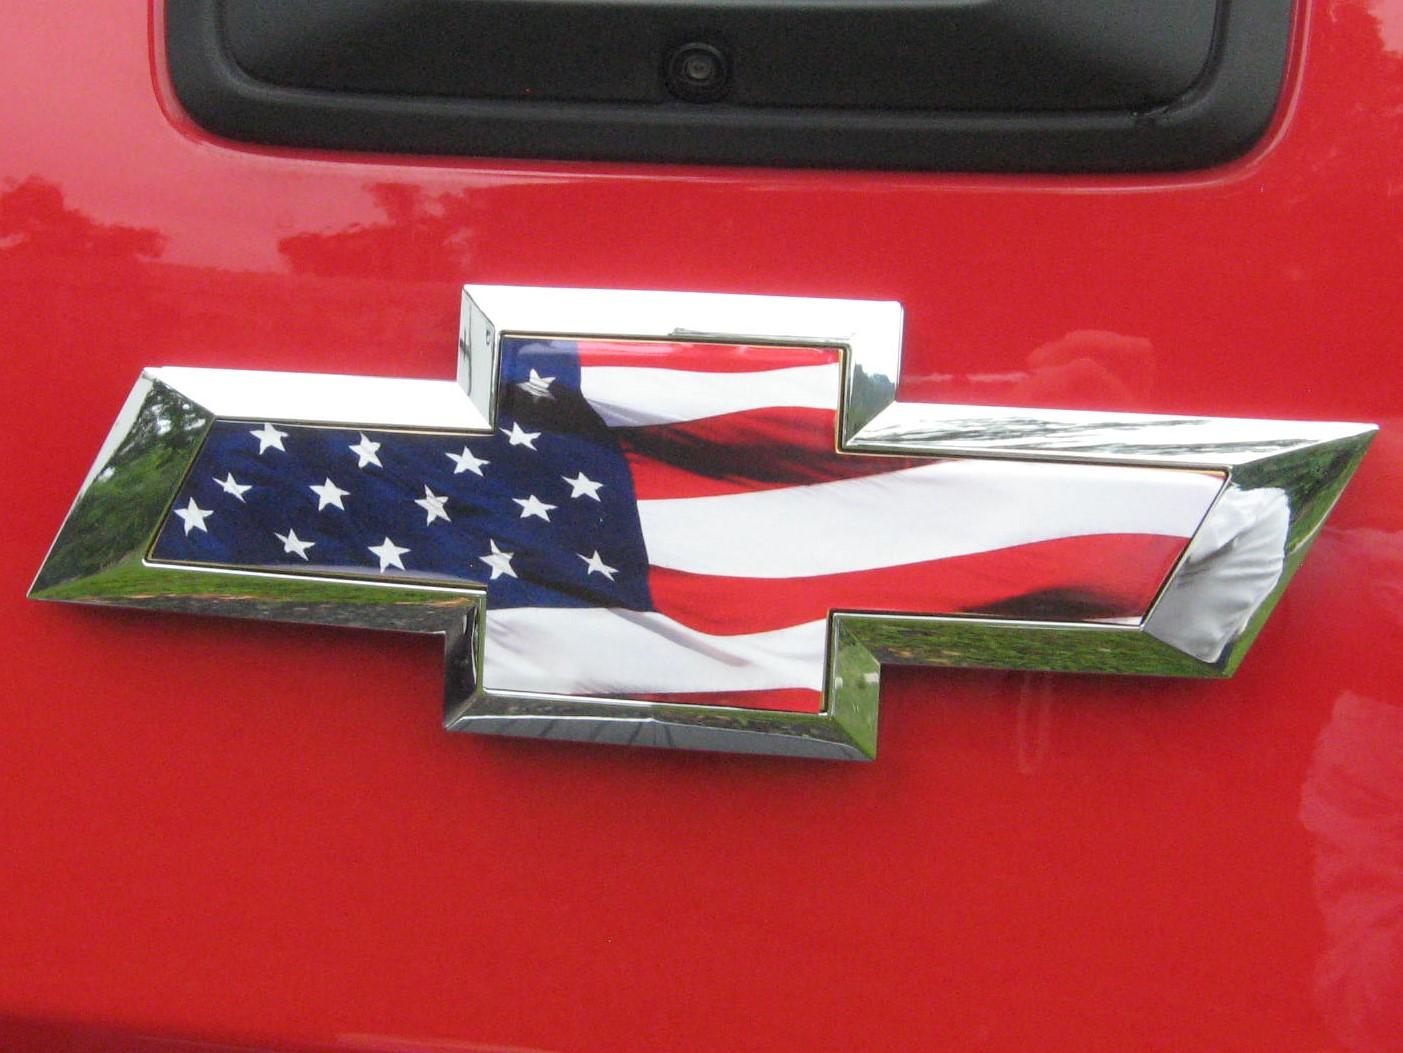 chevy silverado colorado grille tailgate american flag. Black Bedroom Furniture Sets. Home Design Ideas